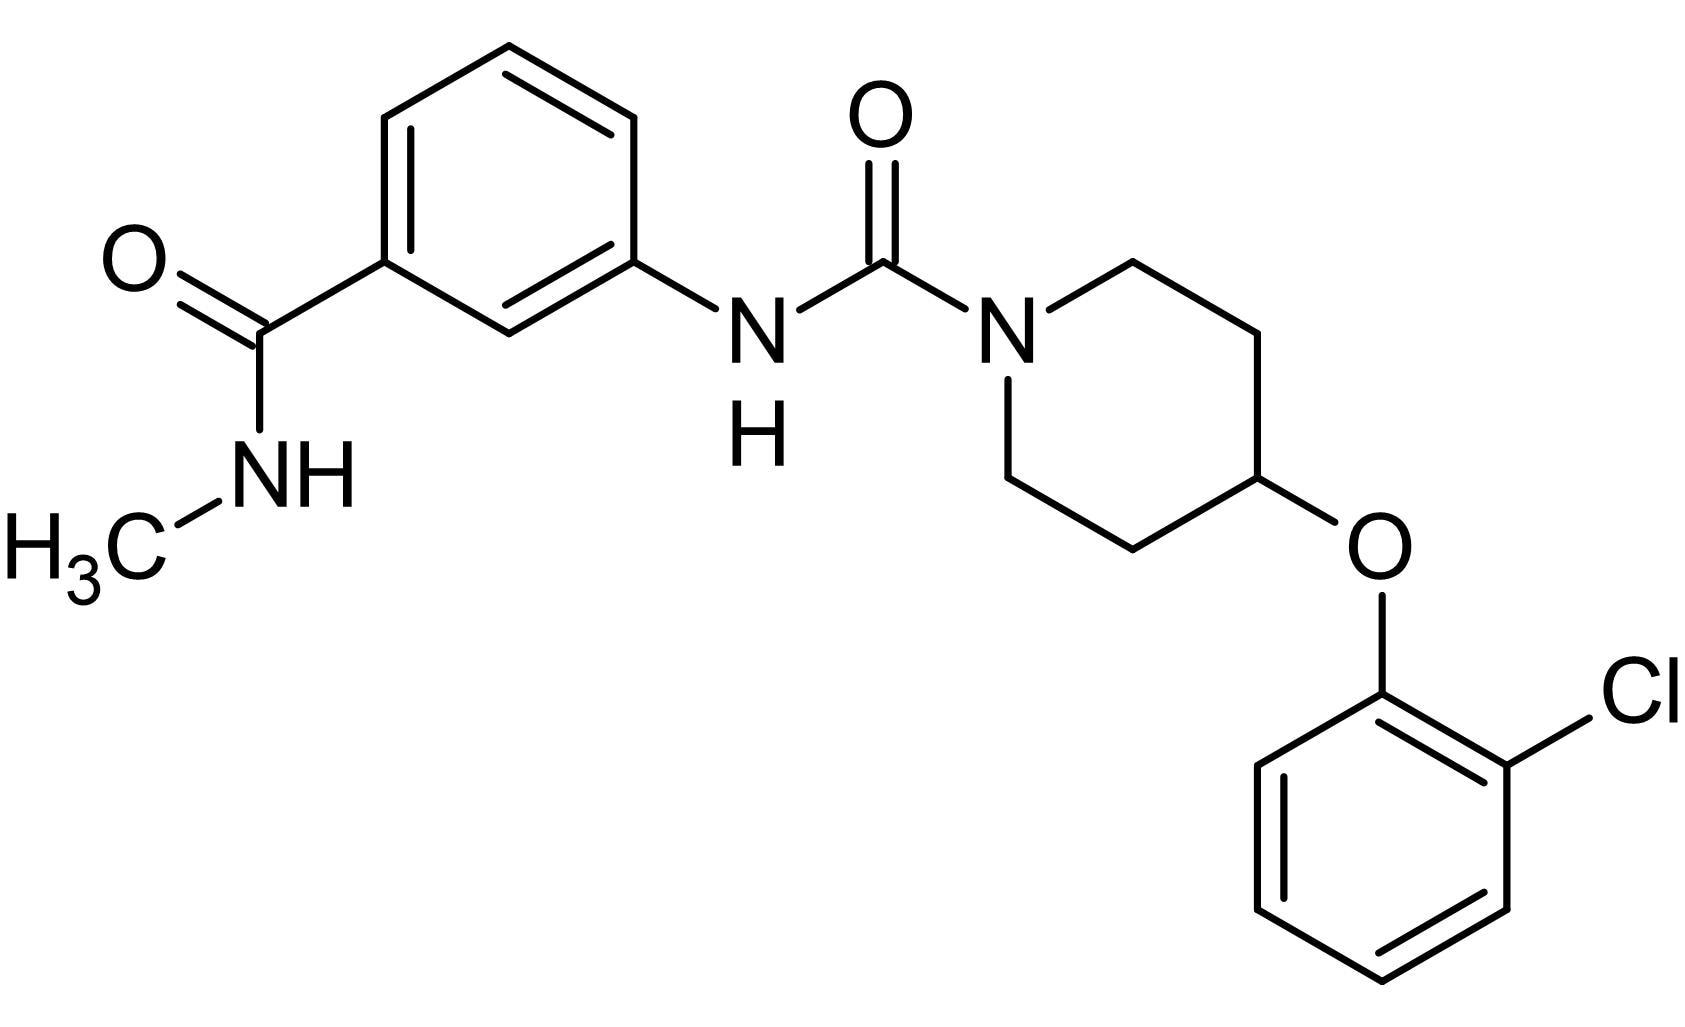 Chemical Structure - SCD1 Inhibitor, SCD1(stearoyl-CoA desaturase 1) inhibitor (ab142089)